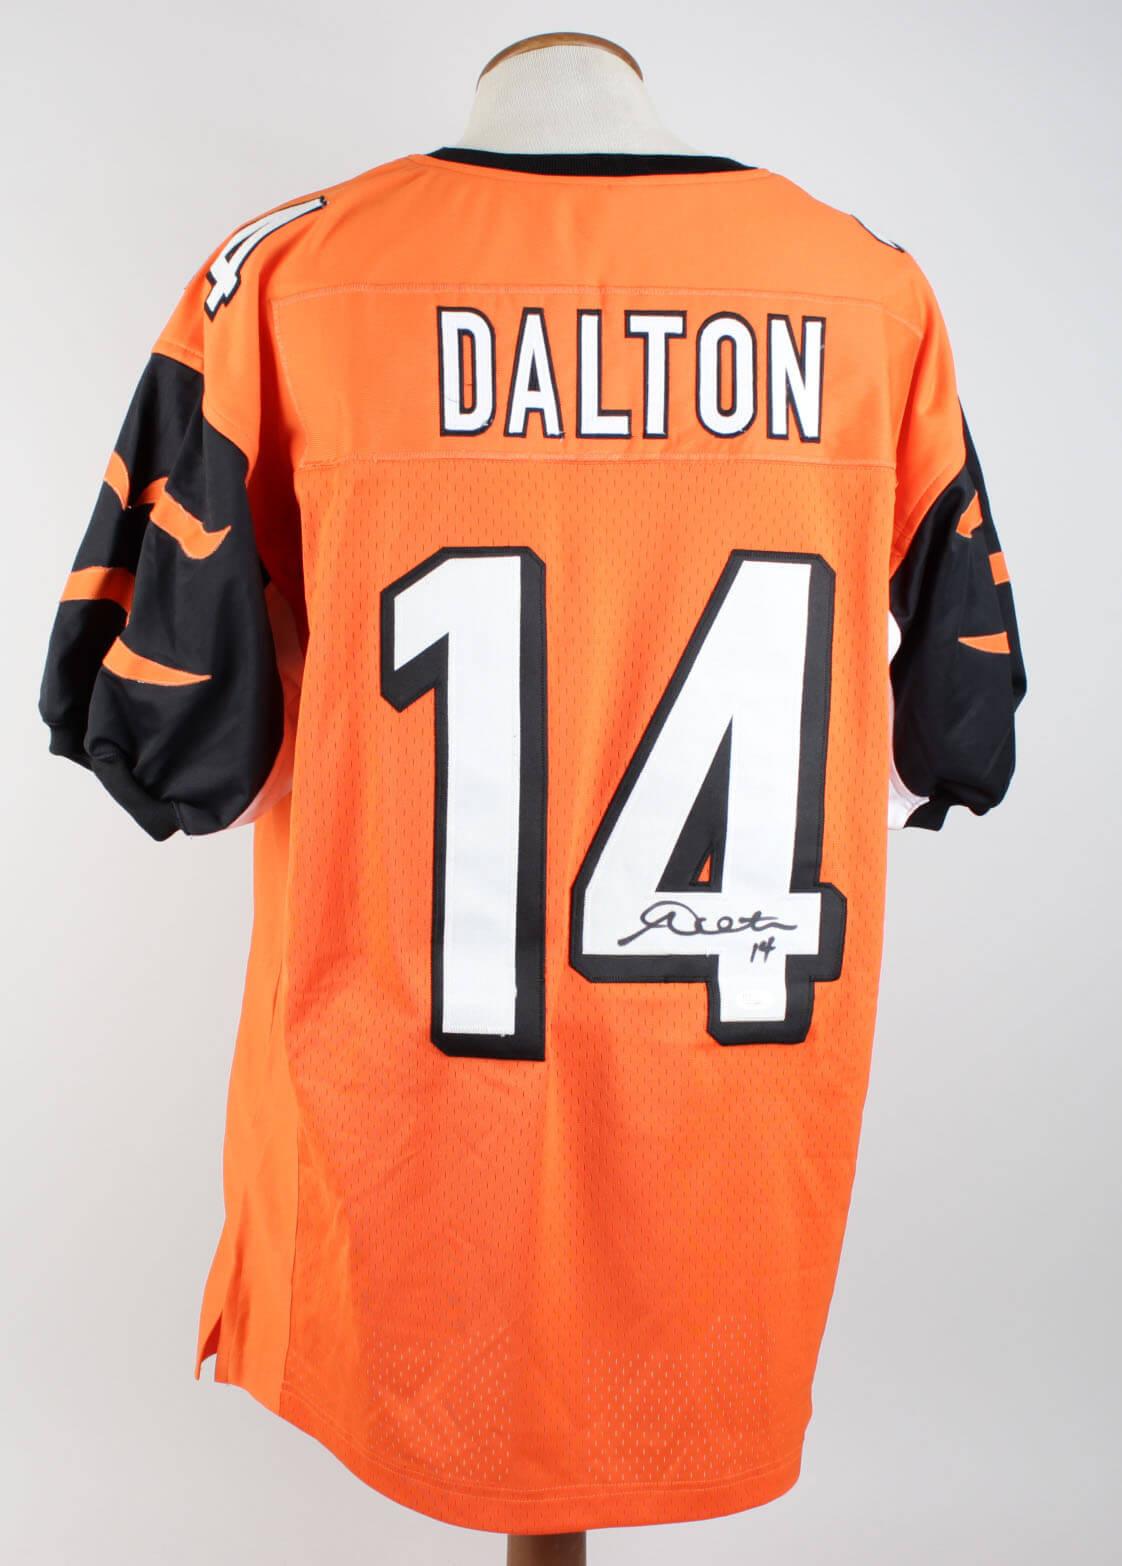 Andy Dalton Signed Jersey Bengals - COA JSA